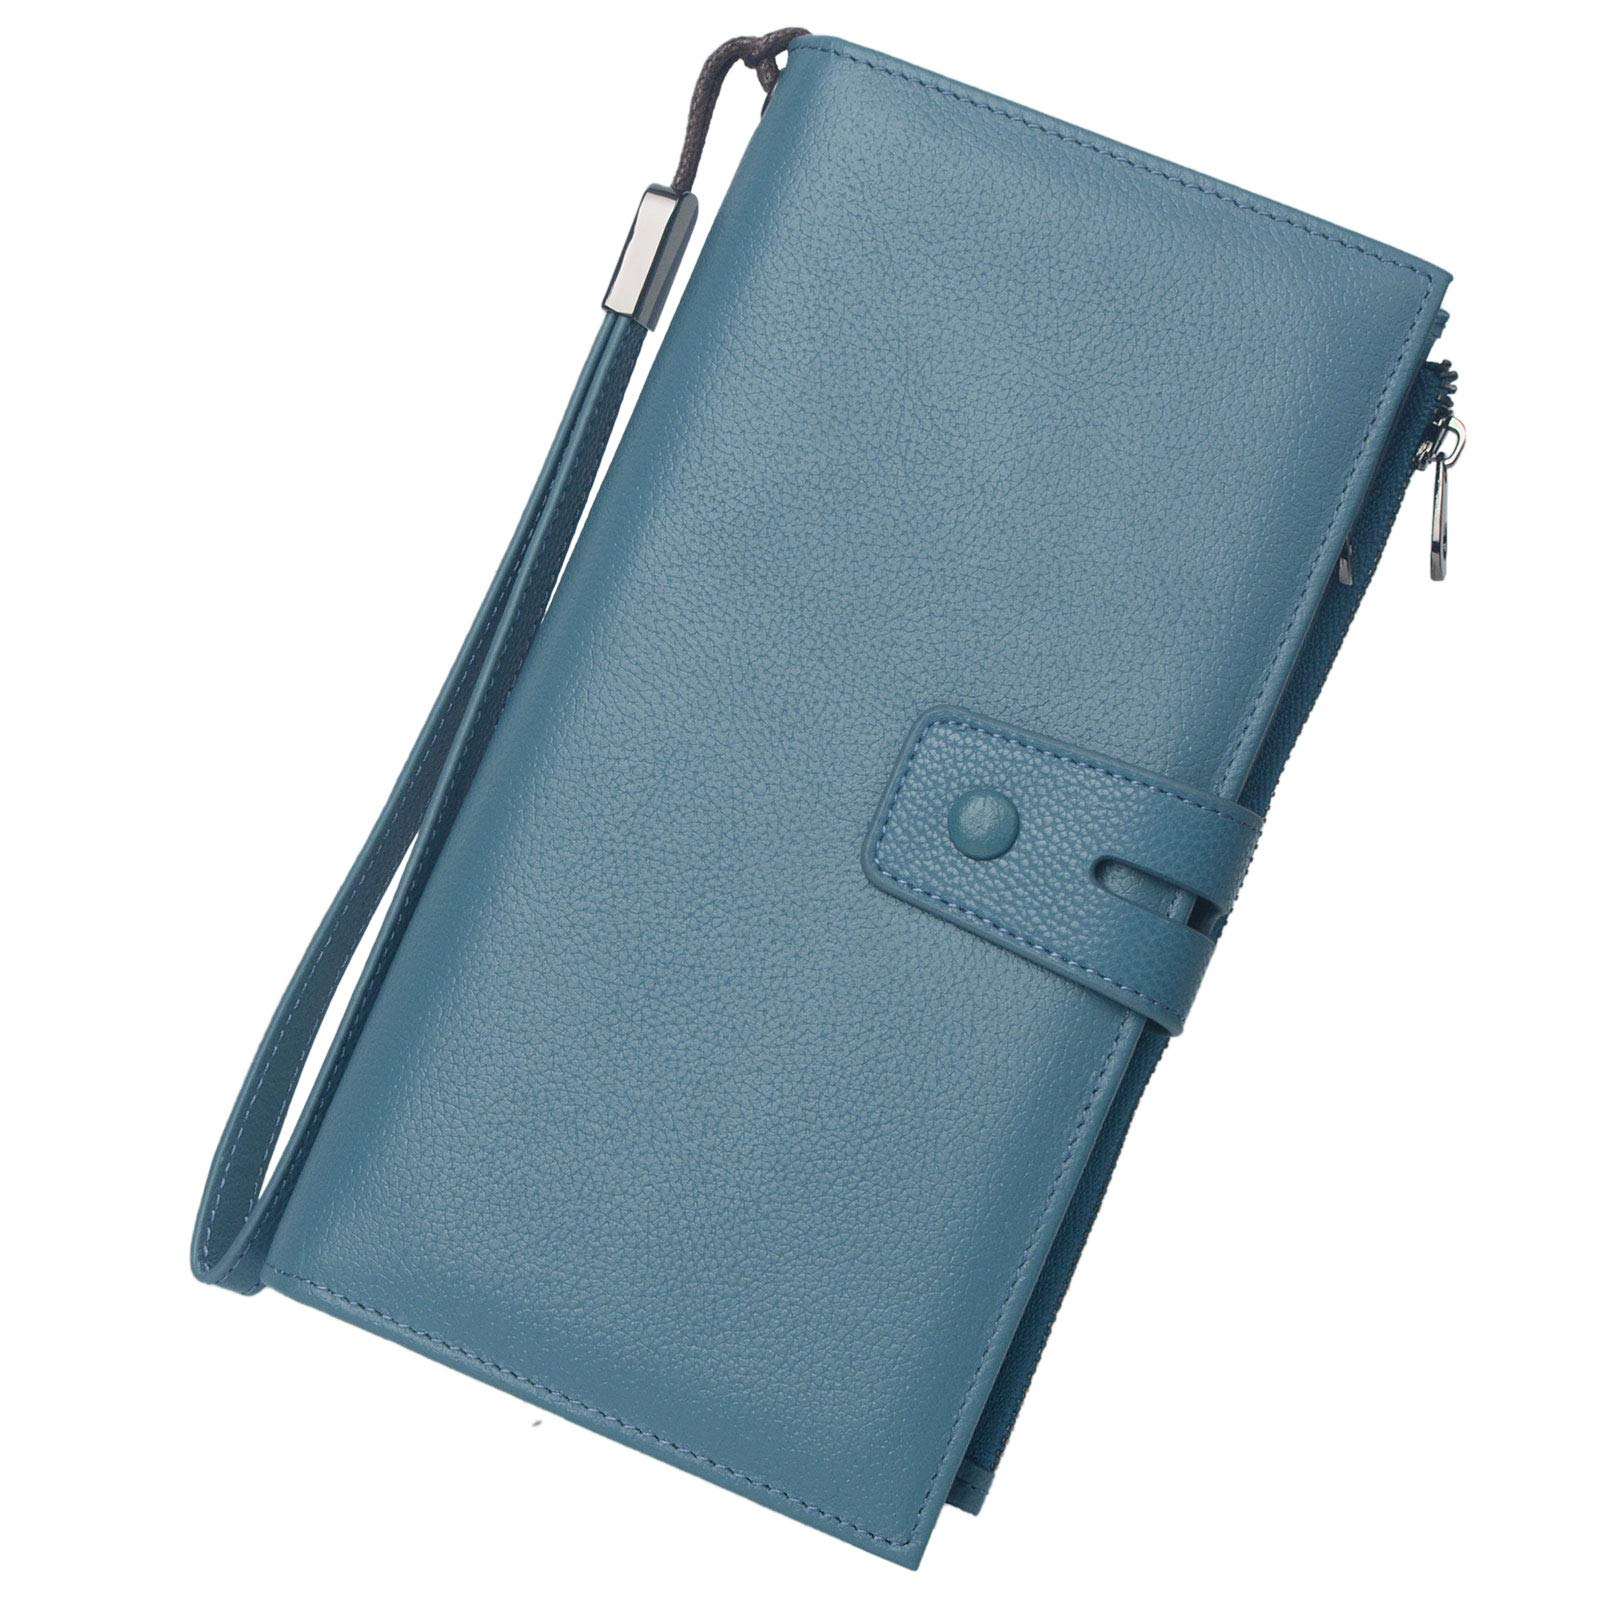 Rfid Blocking Travel Wallet Leather Passport Holder Family Travel Document Organizer (Lake Blue) by Bveyzi